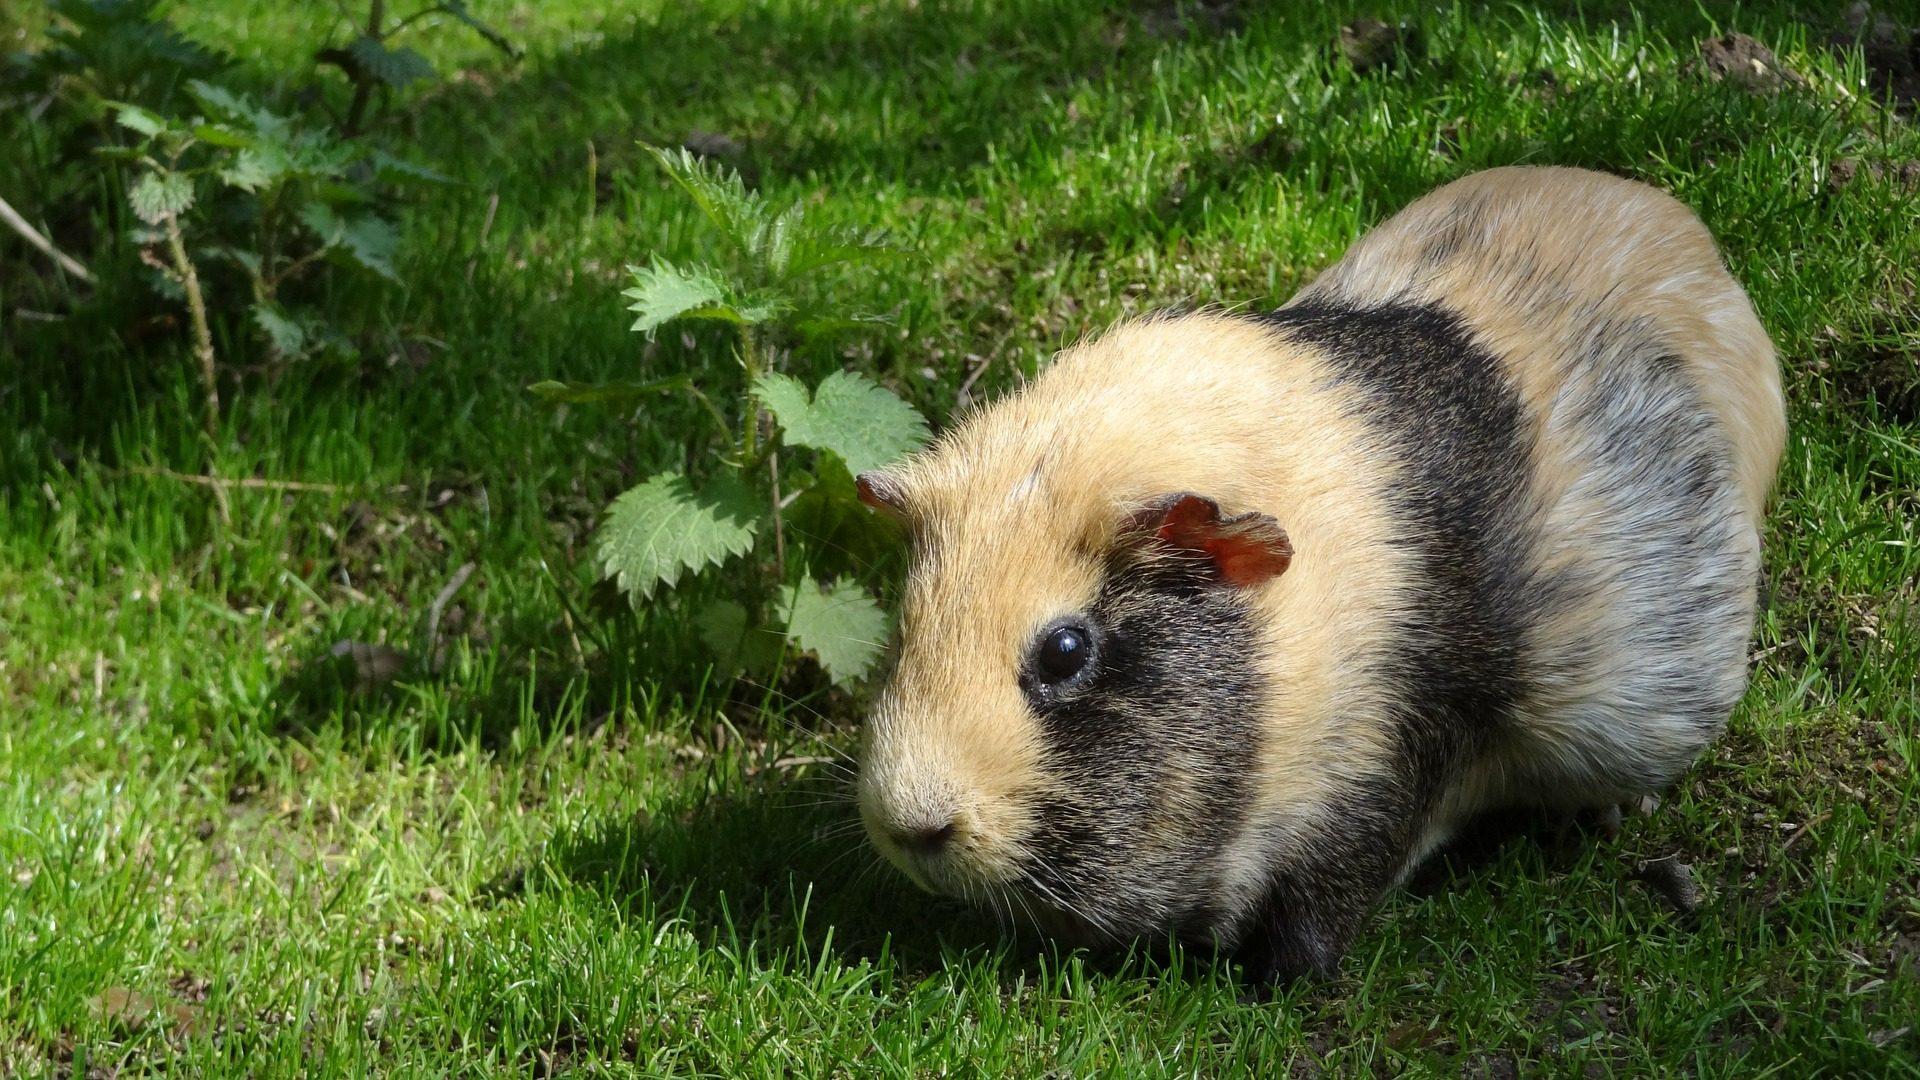 Guiné, Indian, roedor, Animal de estimação, Jardim - Papéis de parede HD - Professor-falken.com